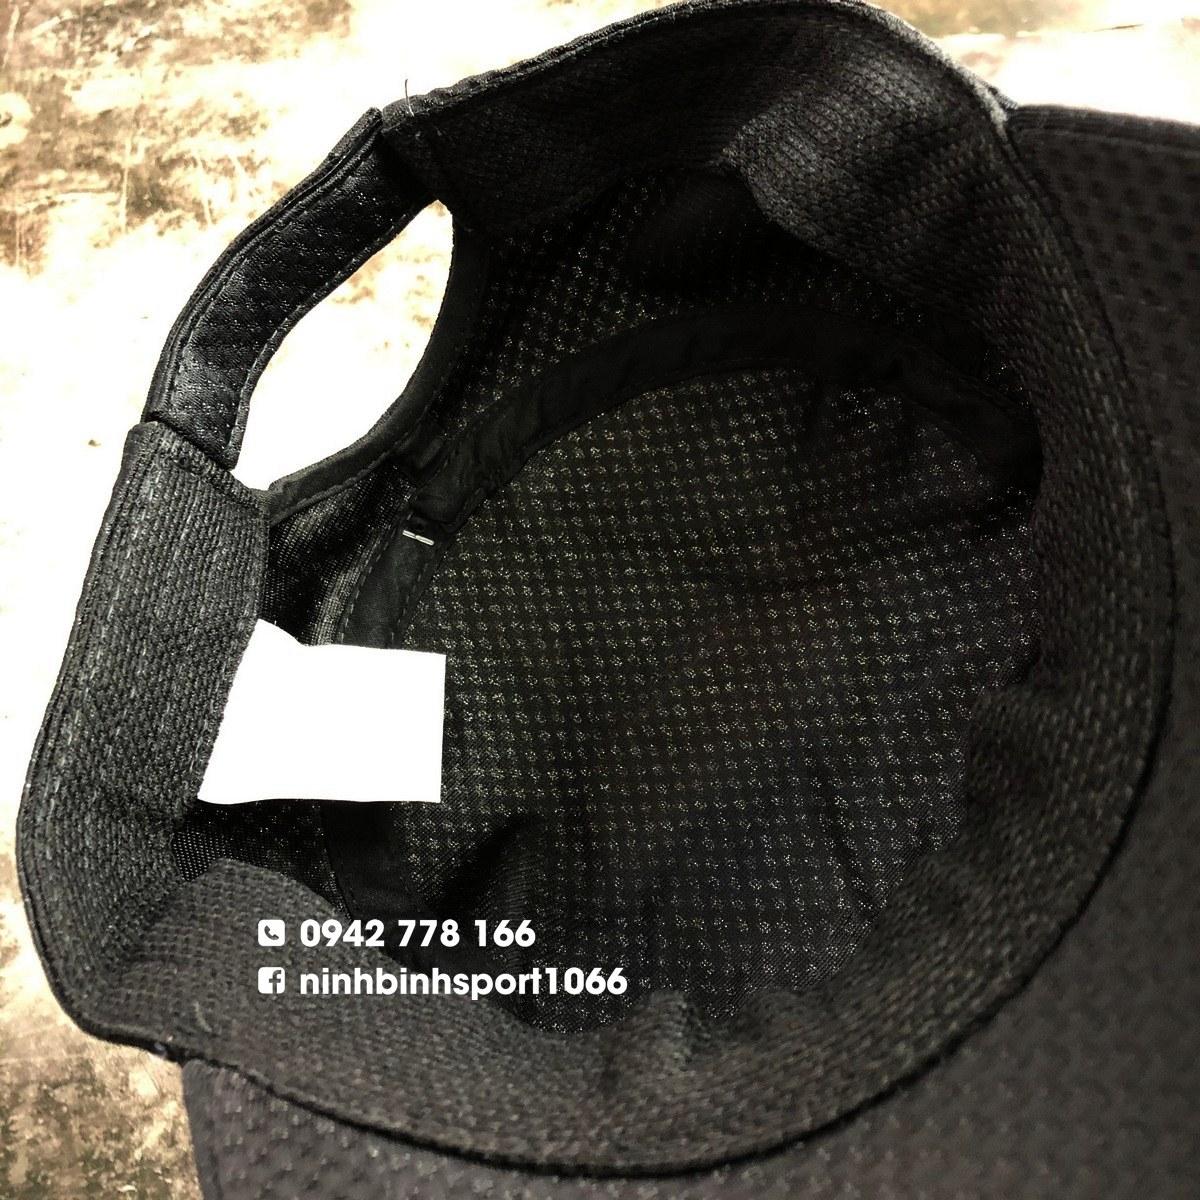 Mũ thể thao Adidas 521-01-OSFX